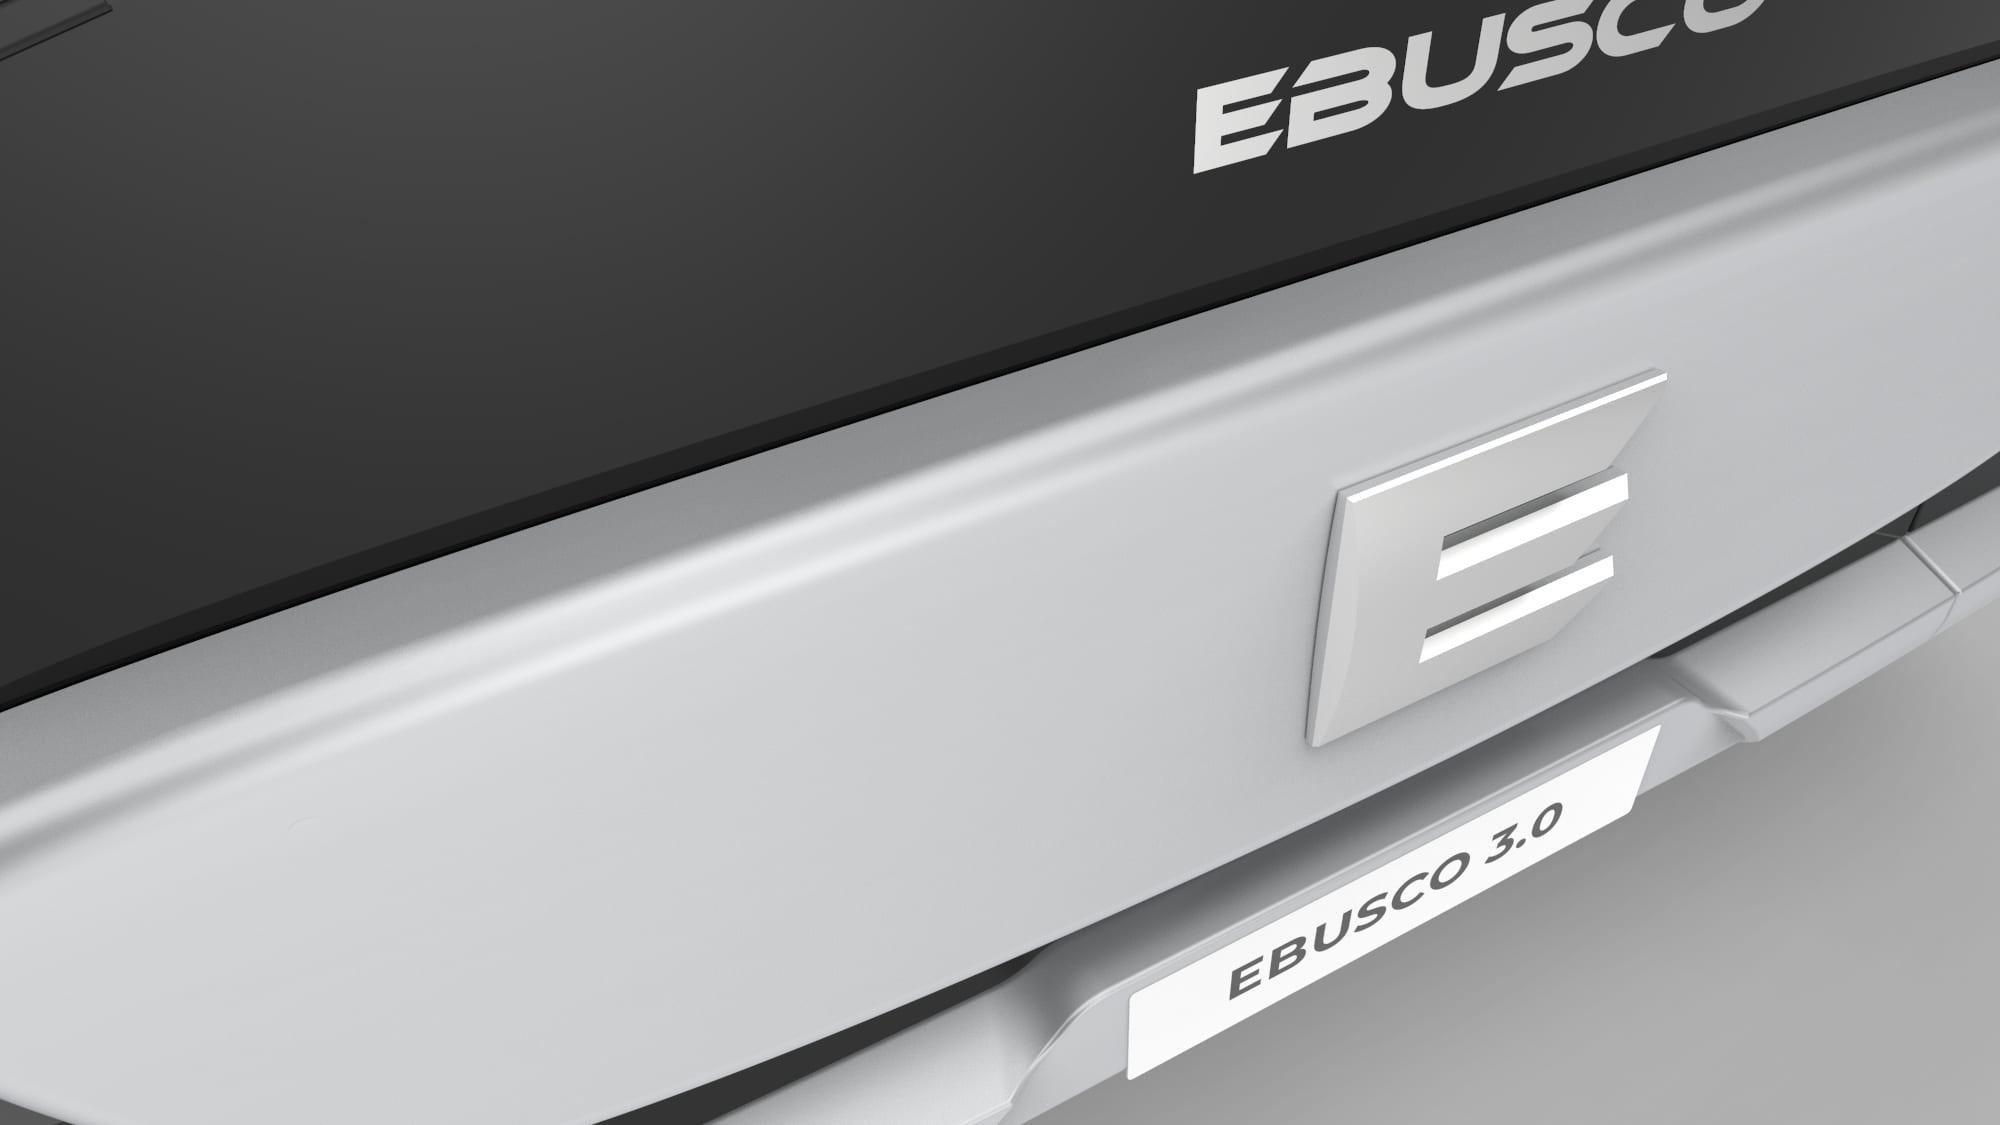 Ebusco 3.0 detailshot